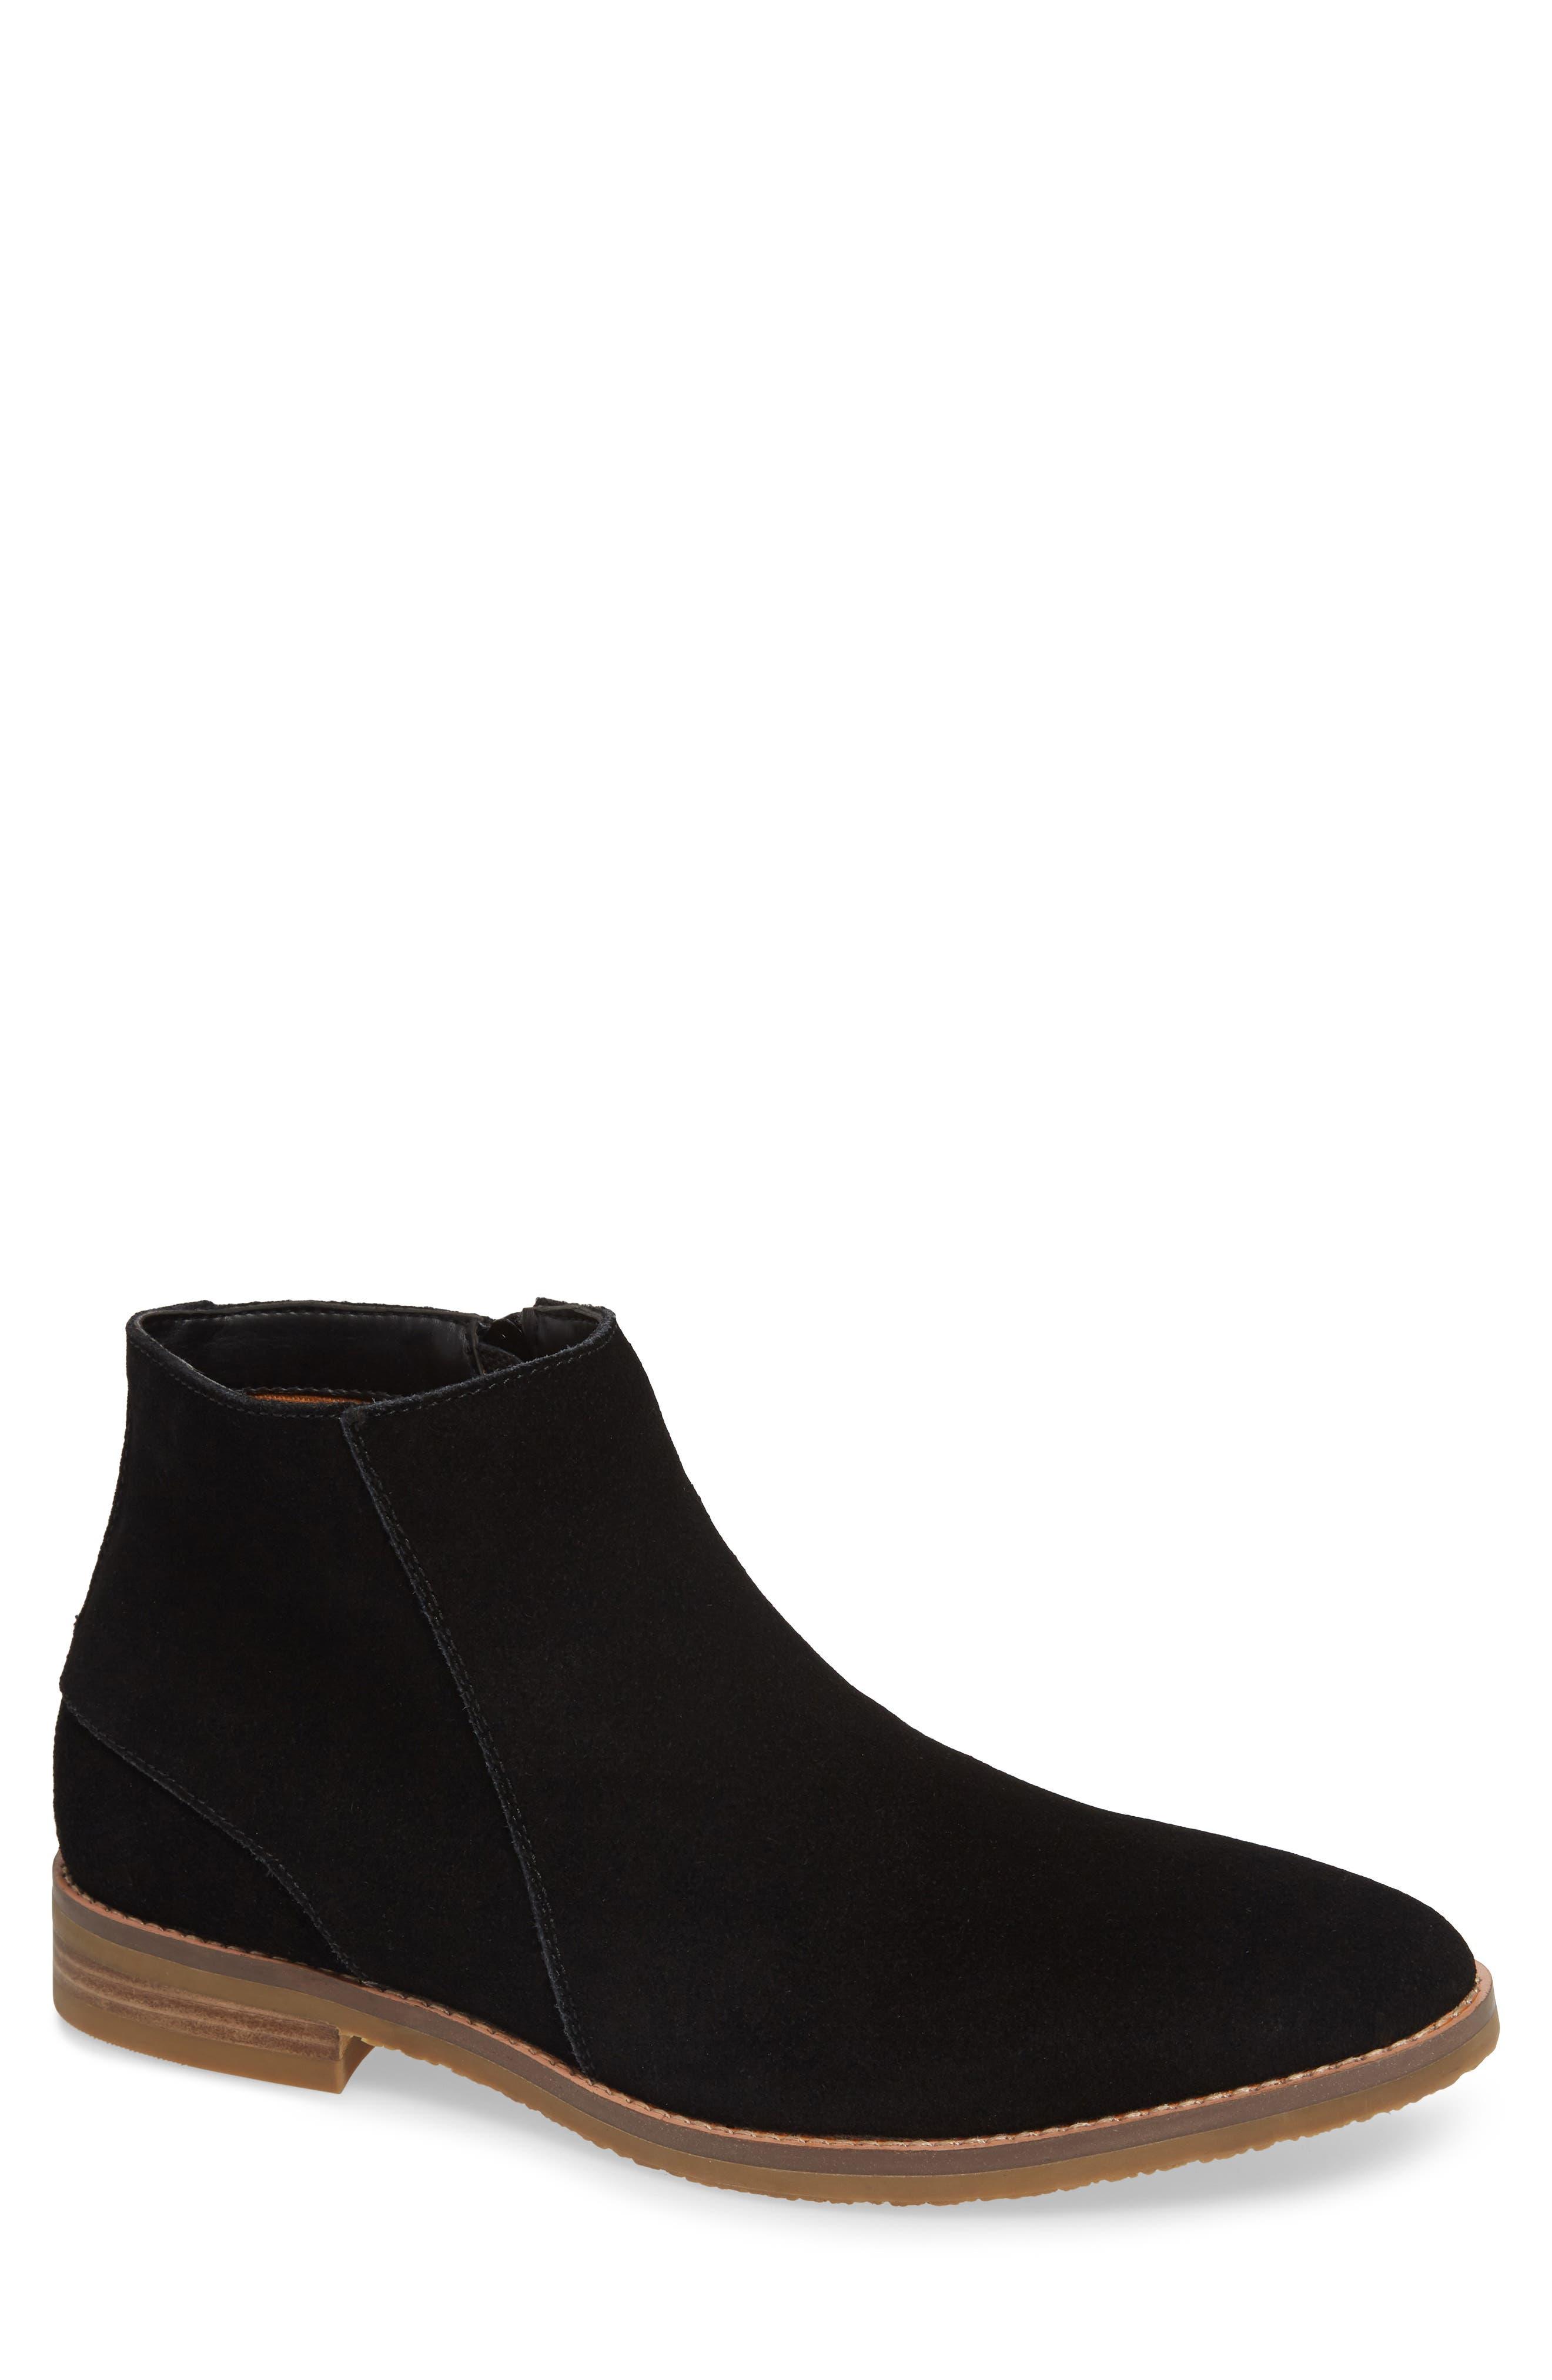 JUMP, Brighton Chelsea Zip Boot, Main thumbnail 1, color, BLACK